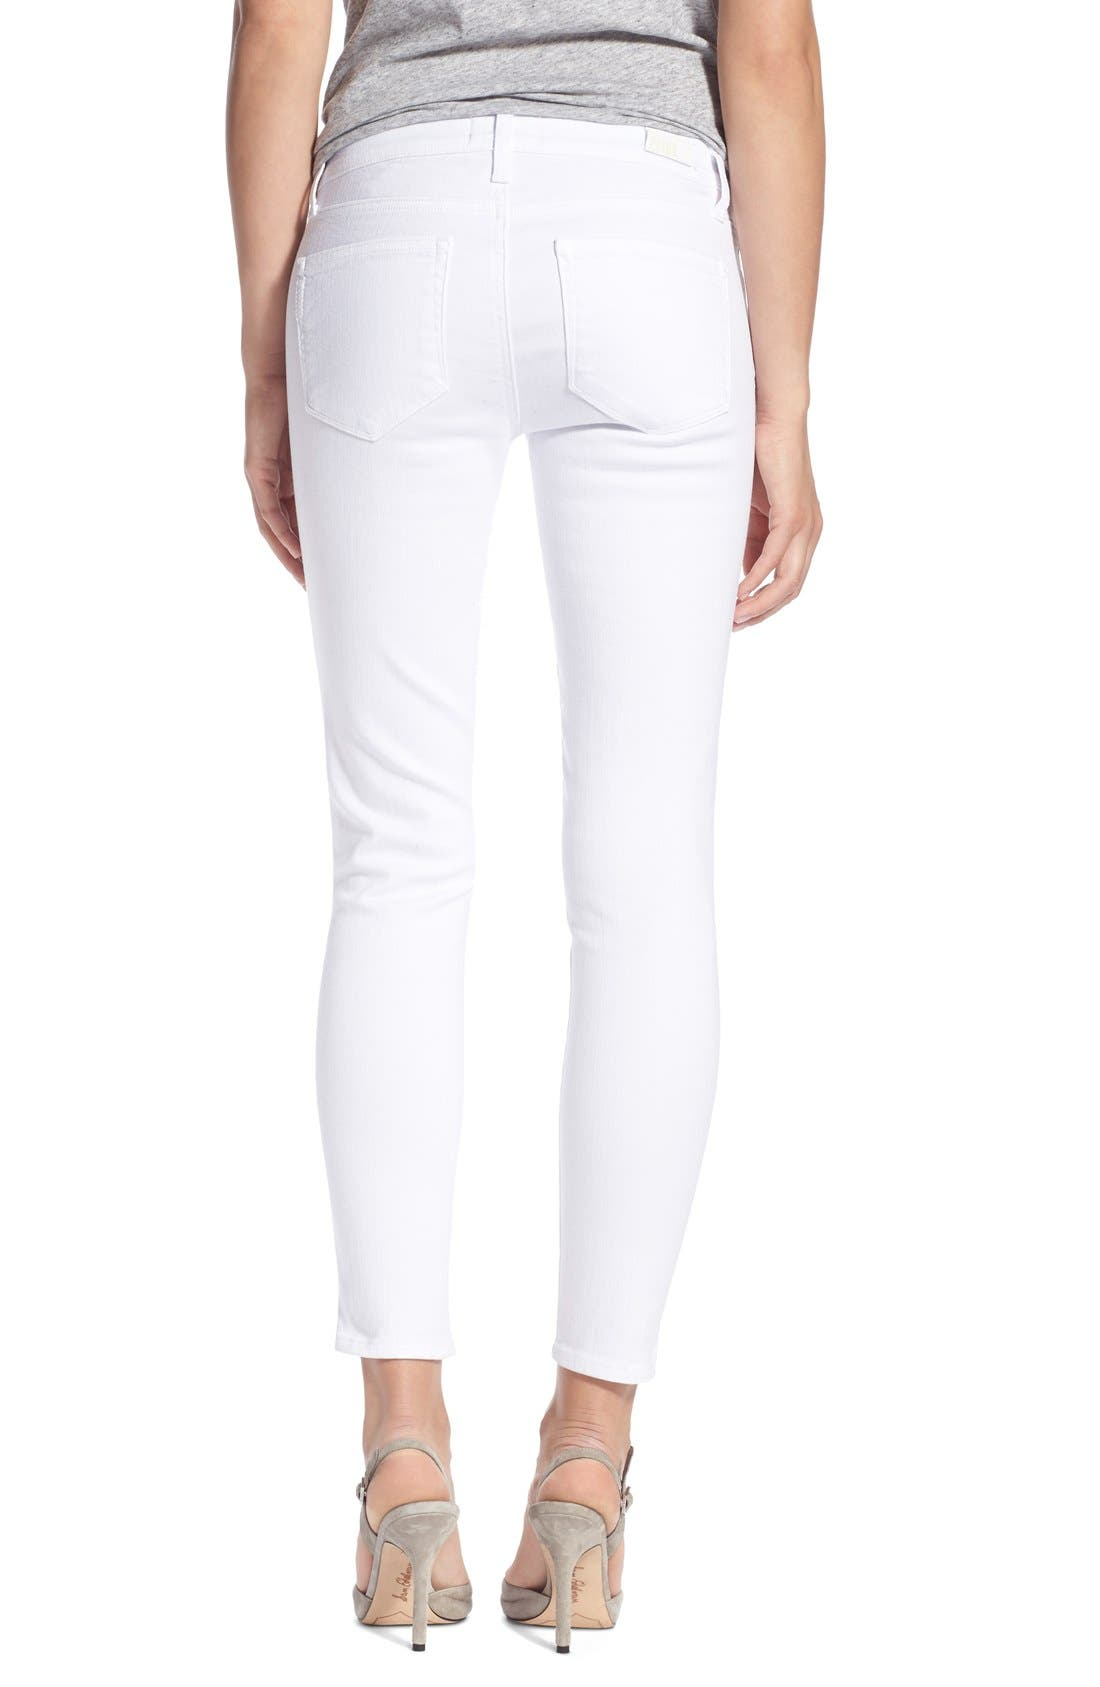 Alternate Image 3  - PAIGE 'Verdugo' Ankle Skinny Jeans (Ultra White)